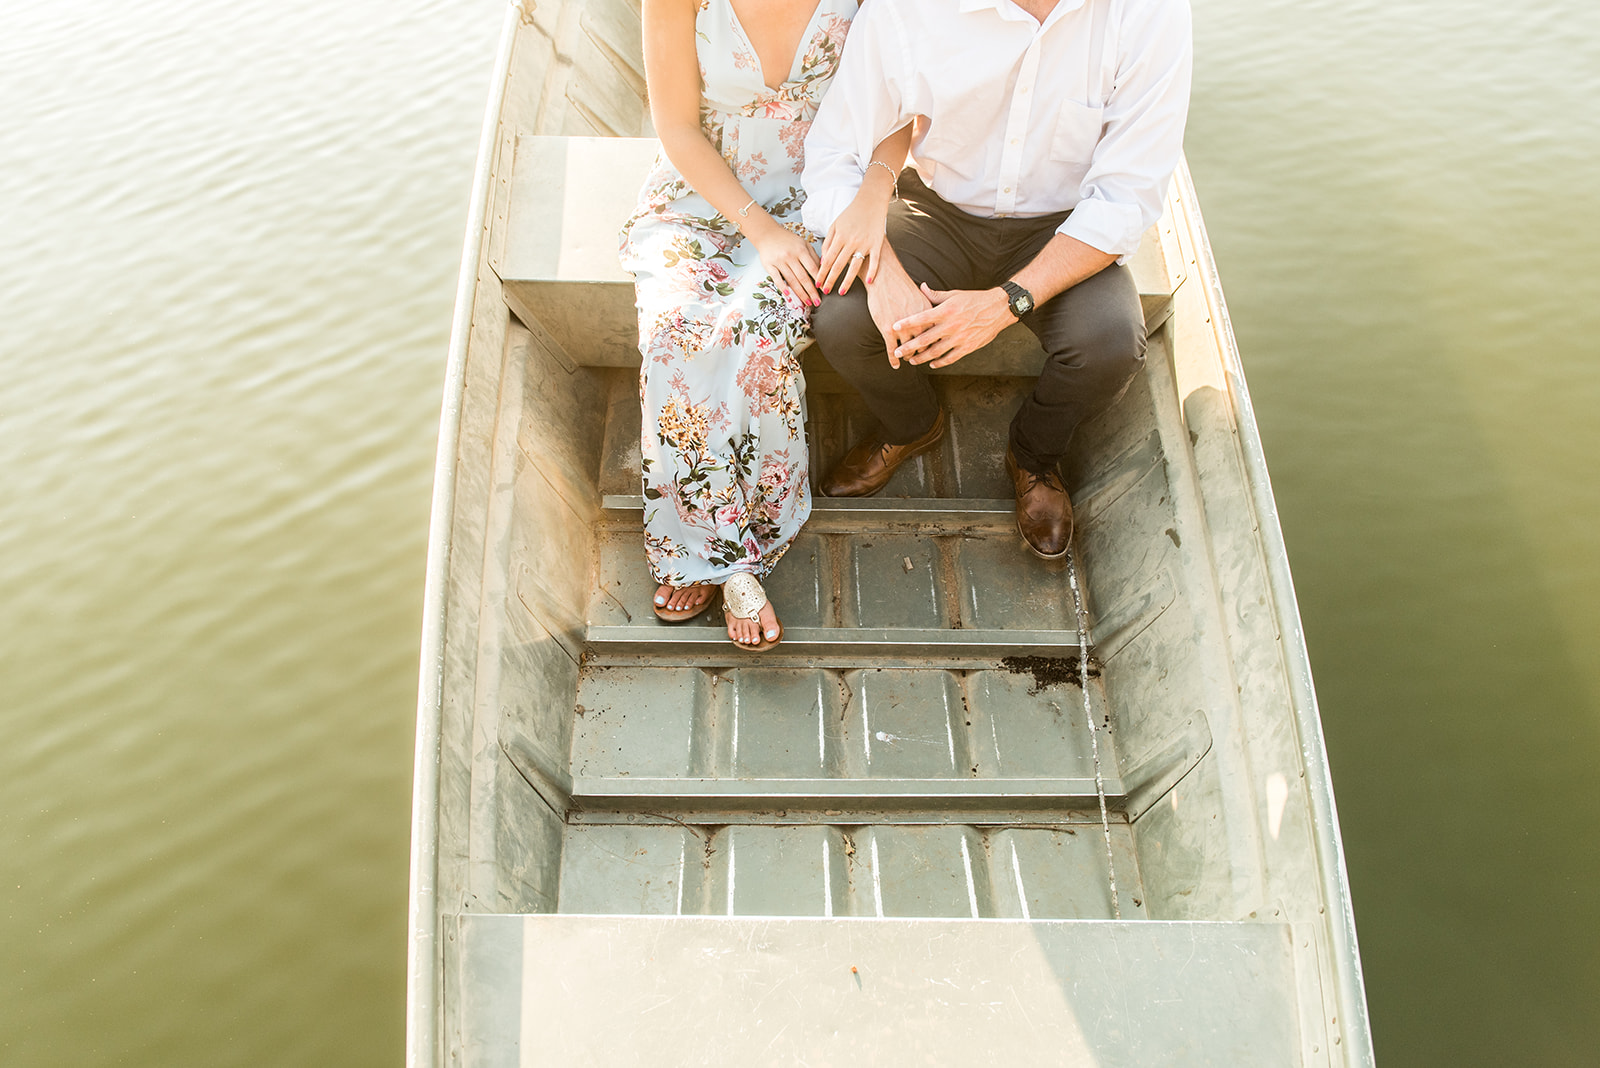 Madalyn Yates Photography Greensboro Wedding Photographer Engagement Session Location Blog Post